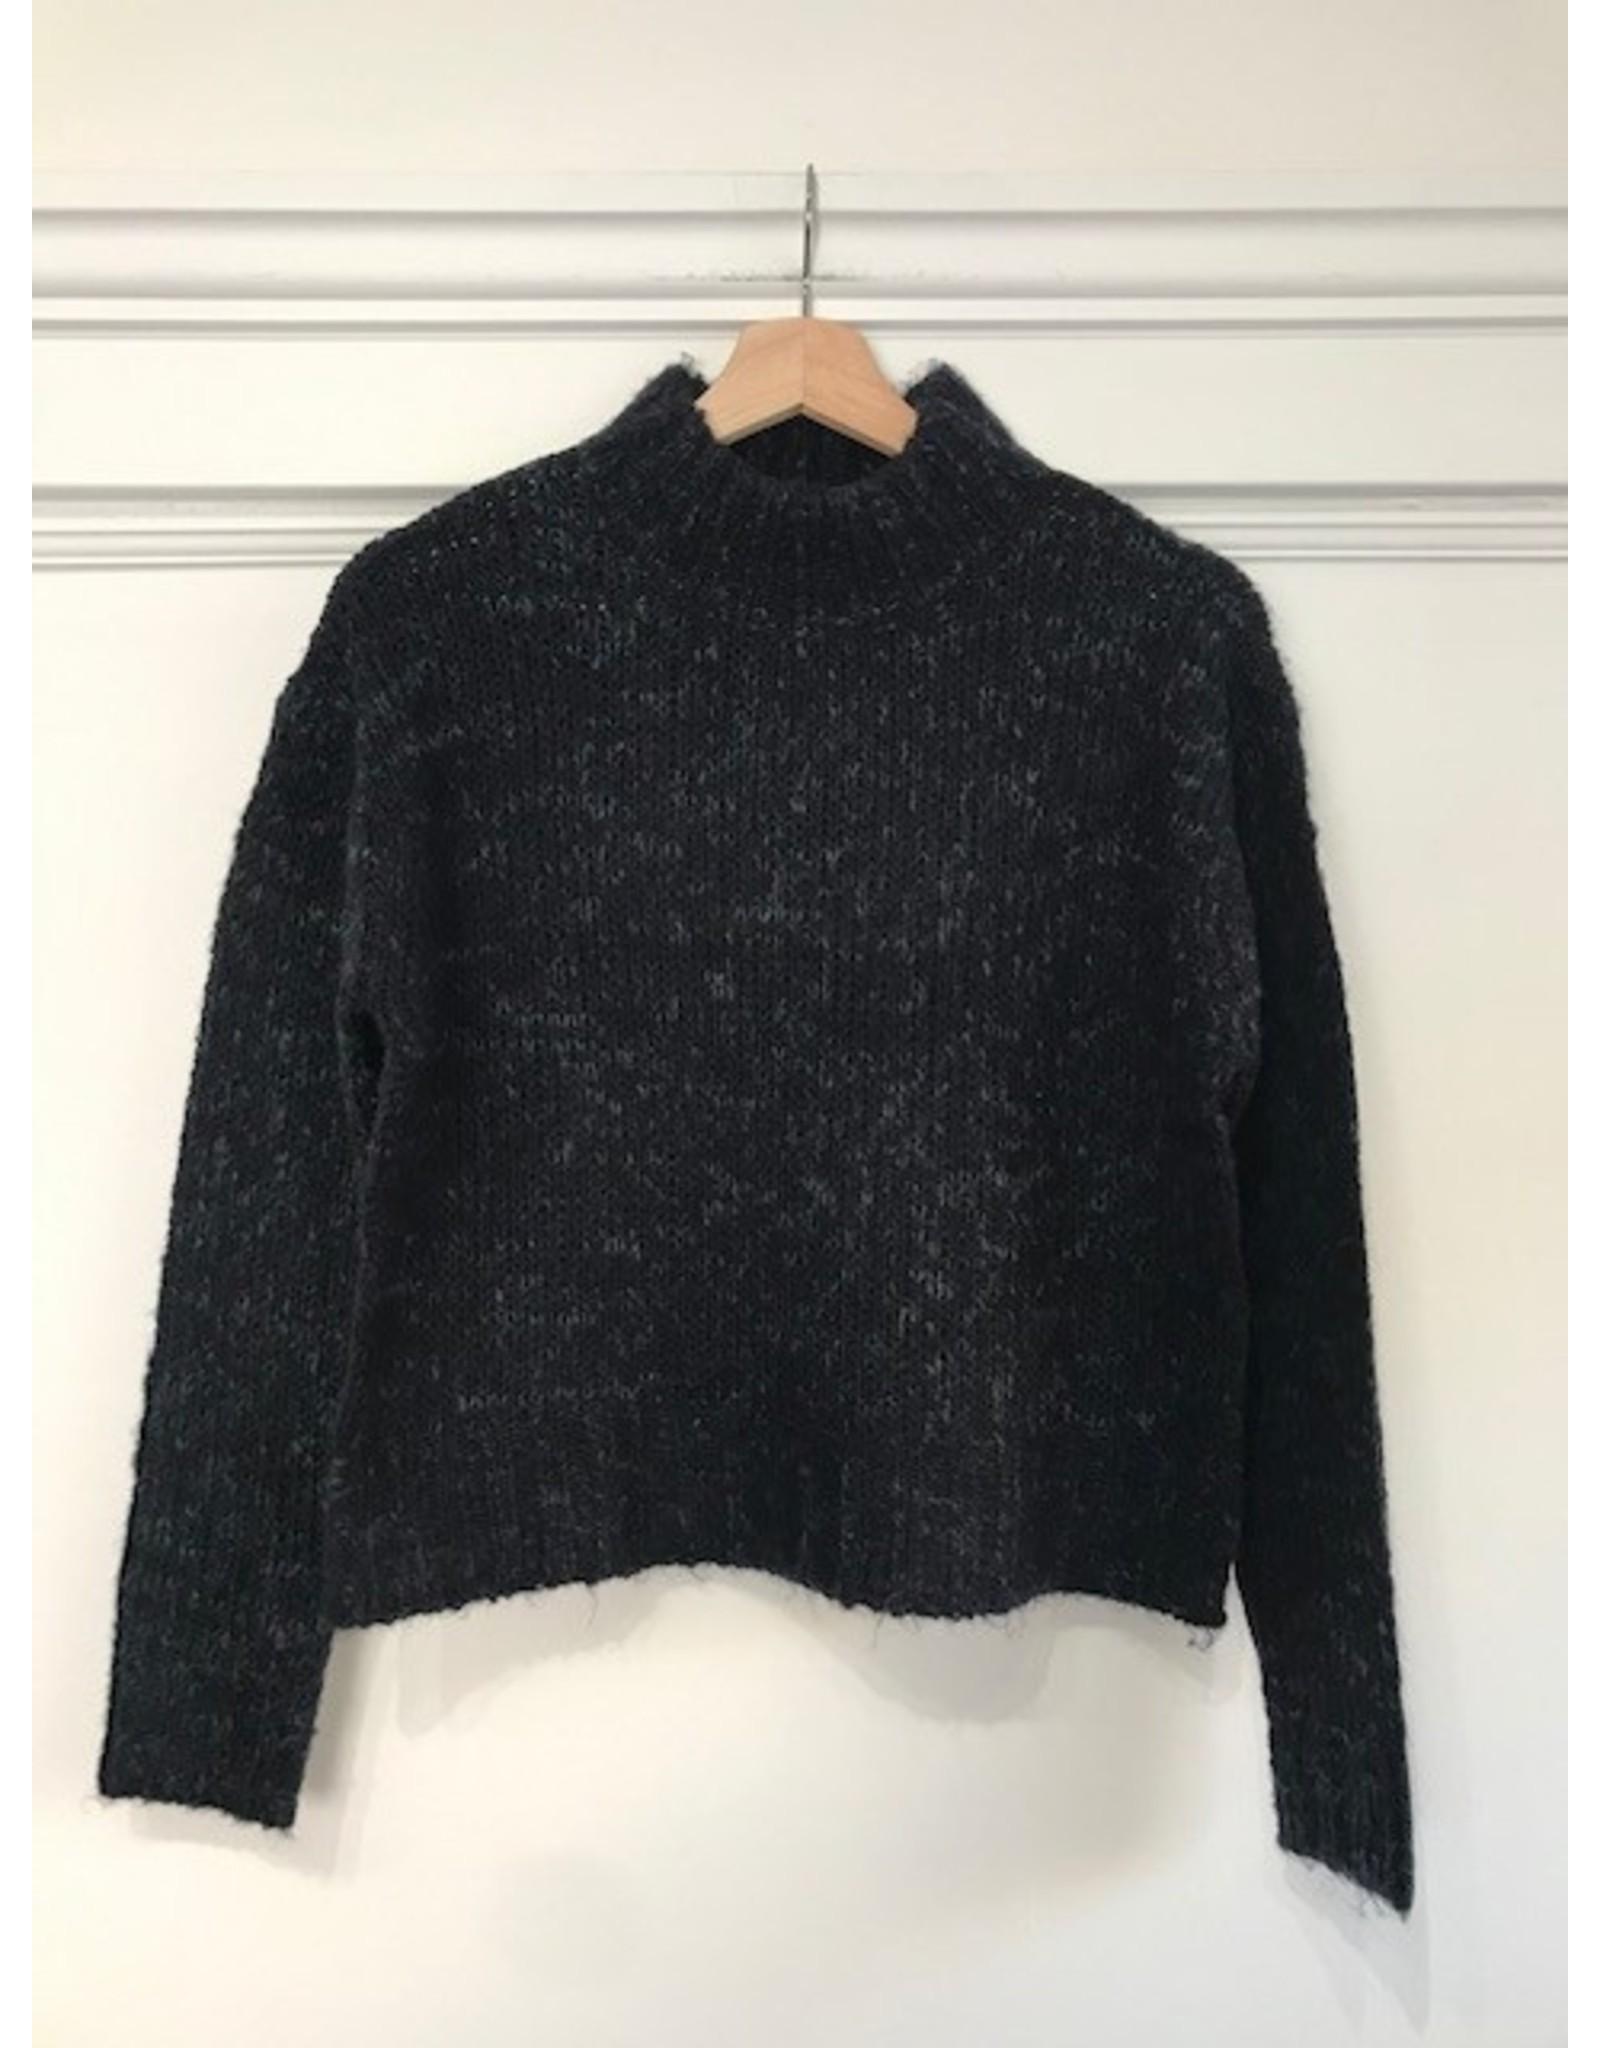 RD Style RD Style - Janie knit sweater (navy twist)